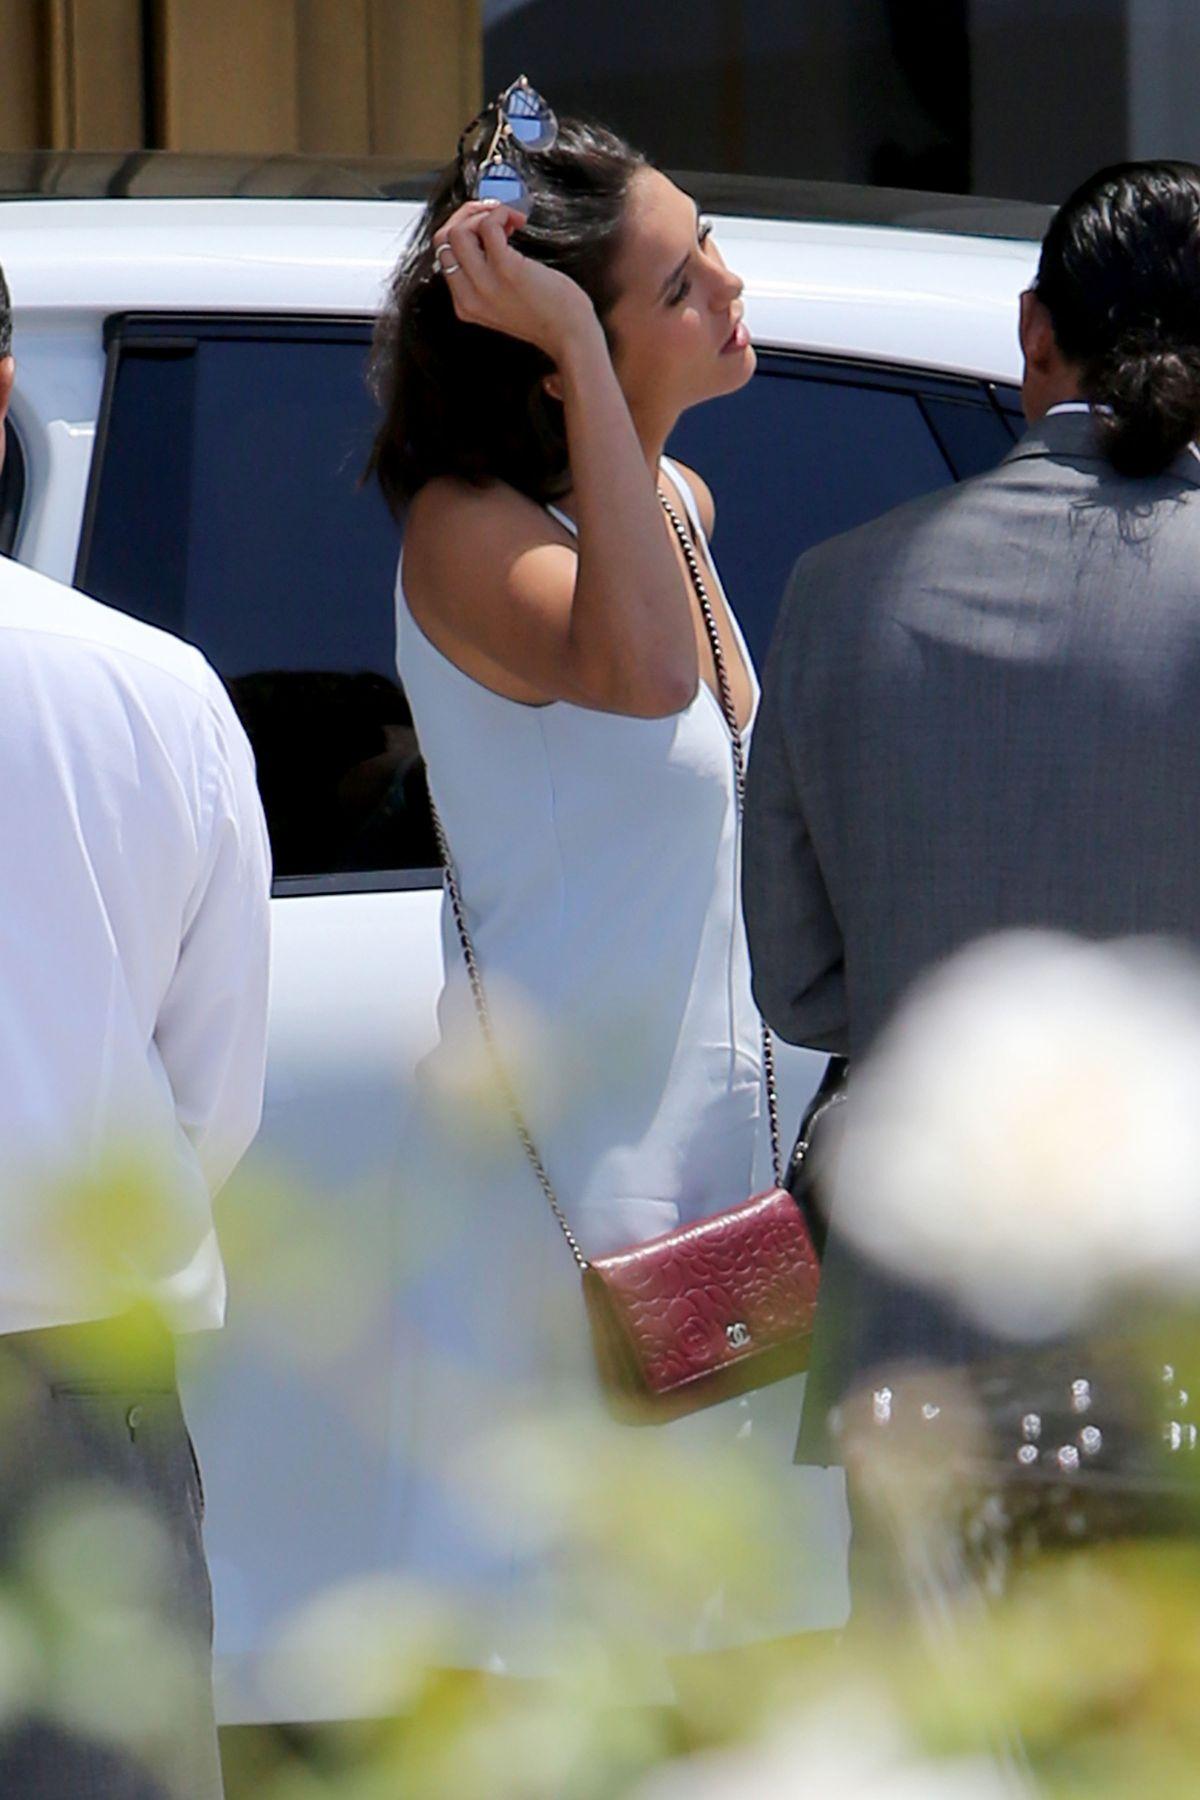 NINA DOBREV at Beverly Hilton Hotel in Los Angeles 07/14/2017